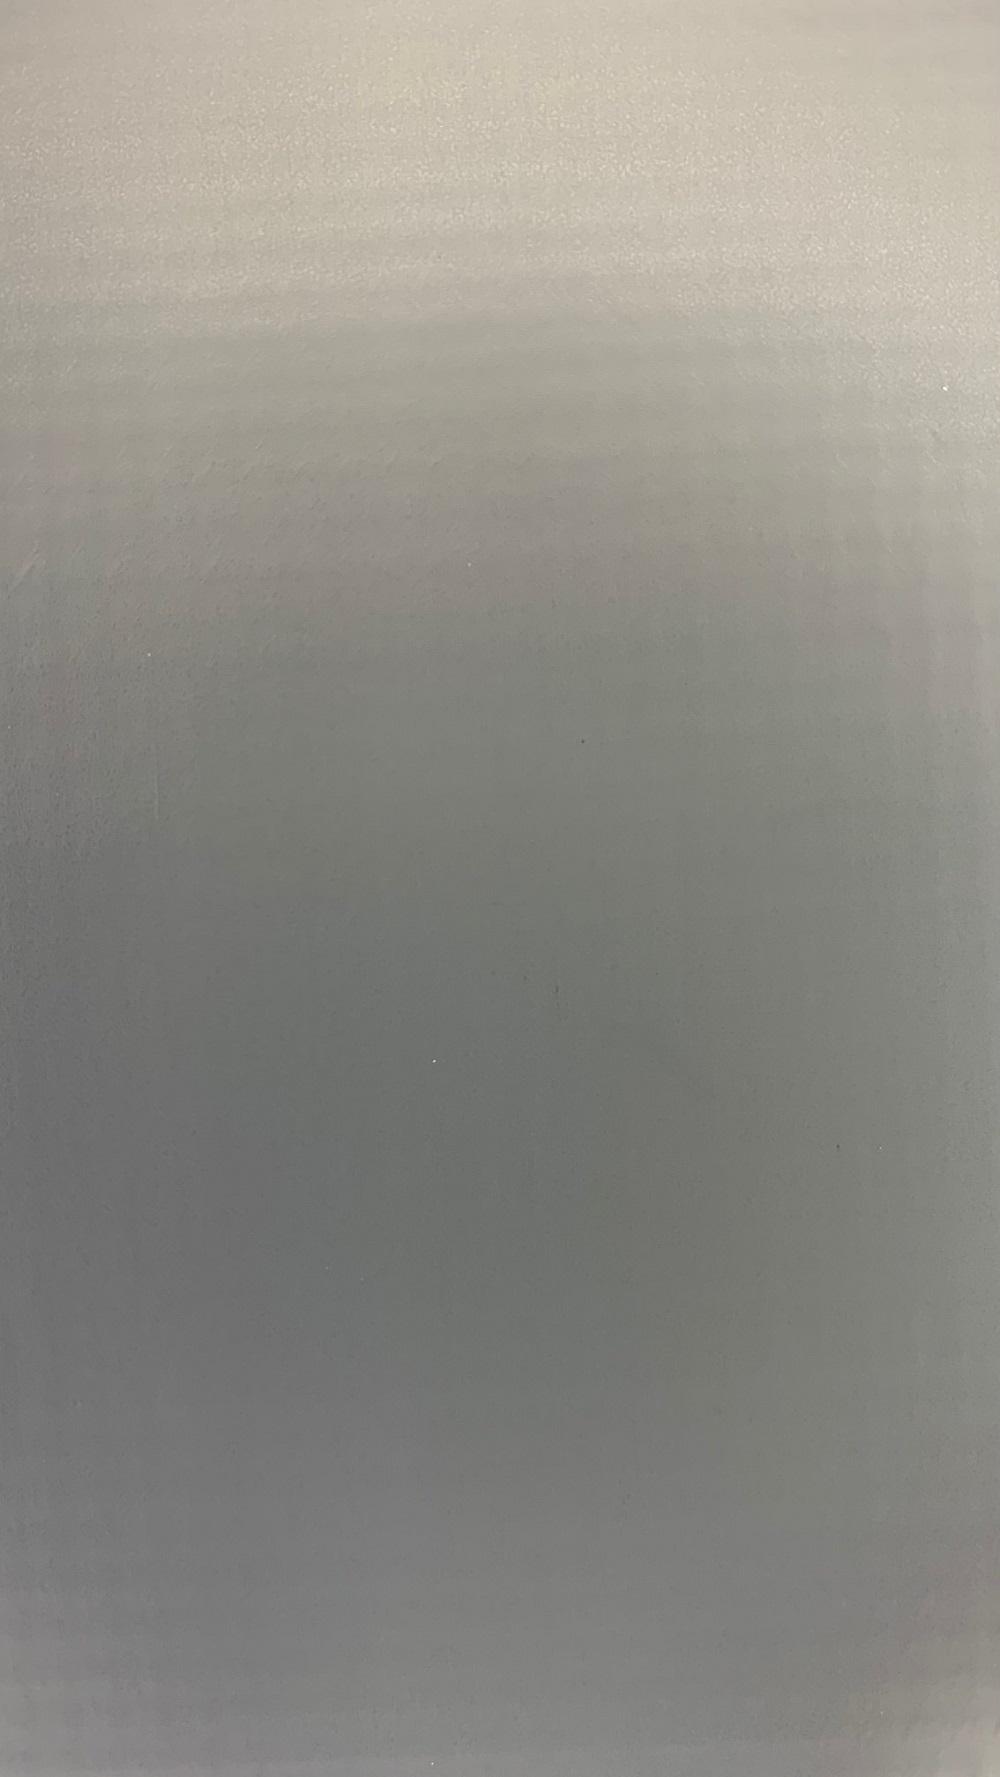 Lona Vinilona Df Fosca Cinza S-155 1,45mt X 1,0mt